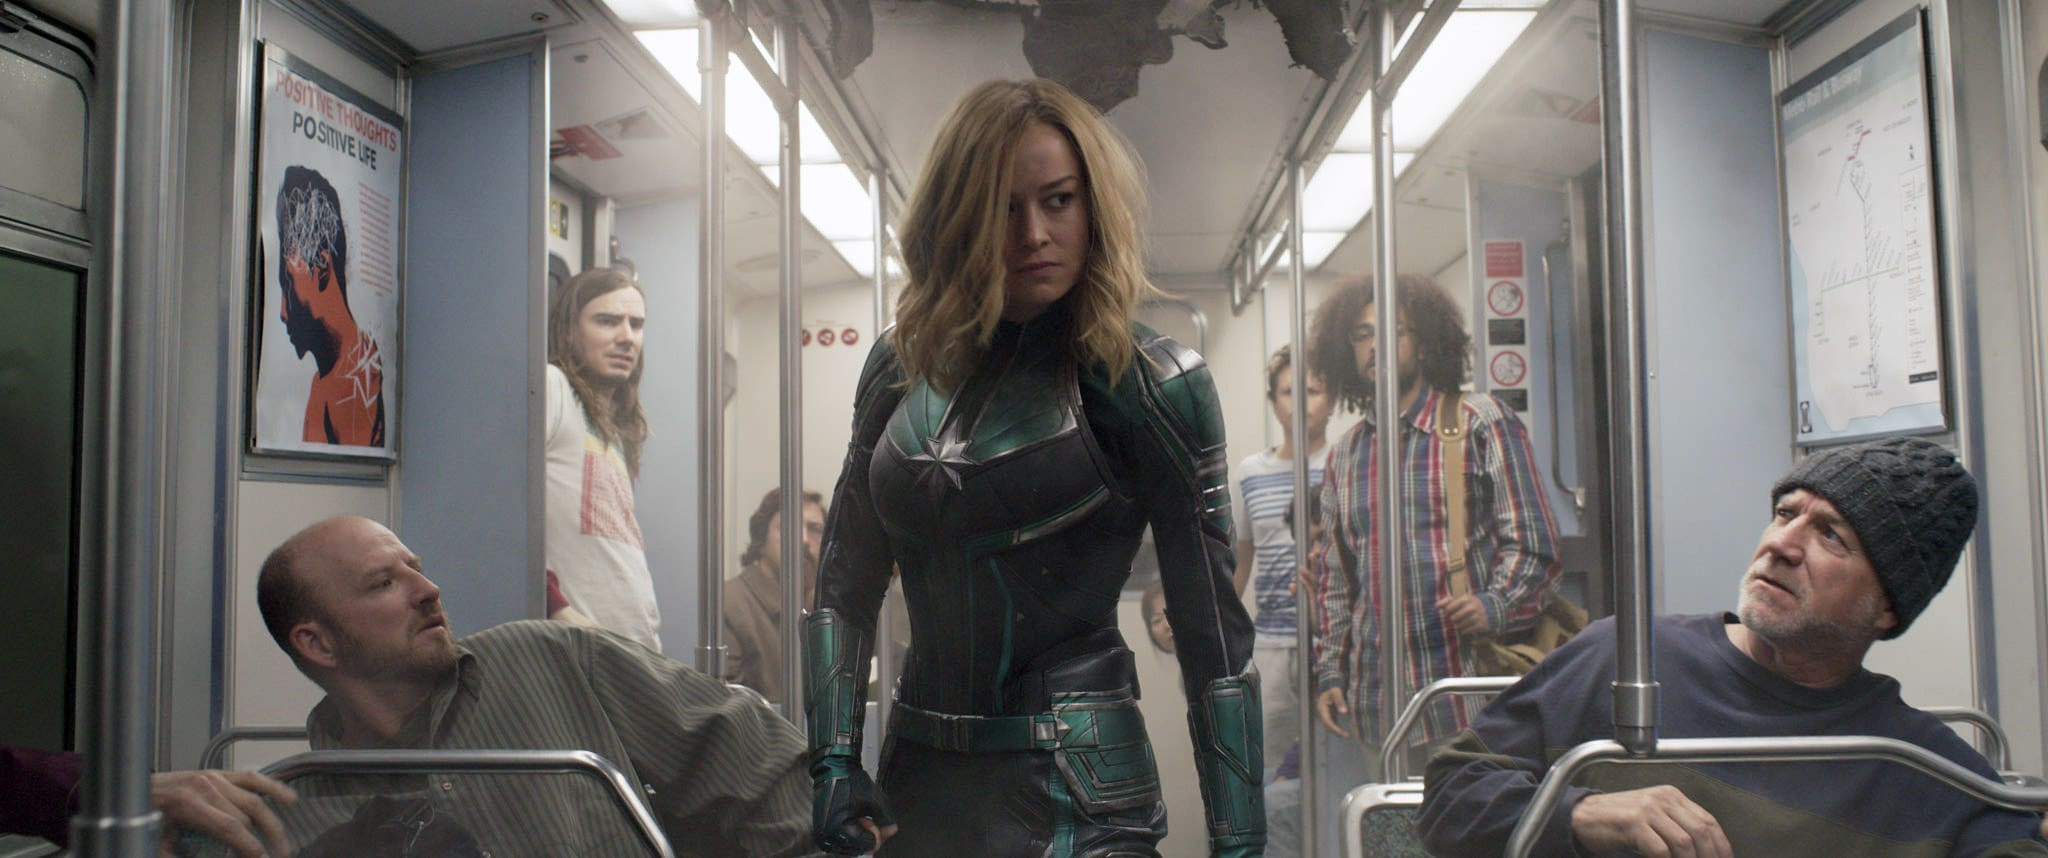 Captain Marvel on a subway